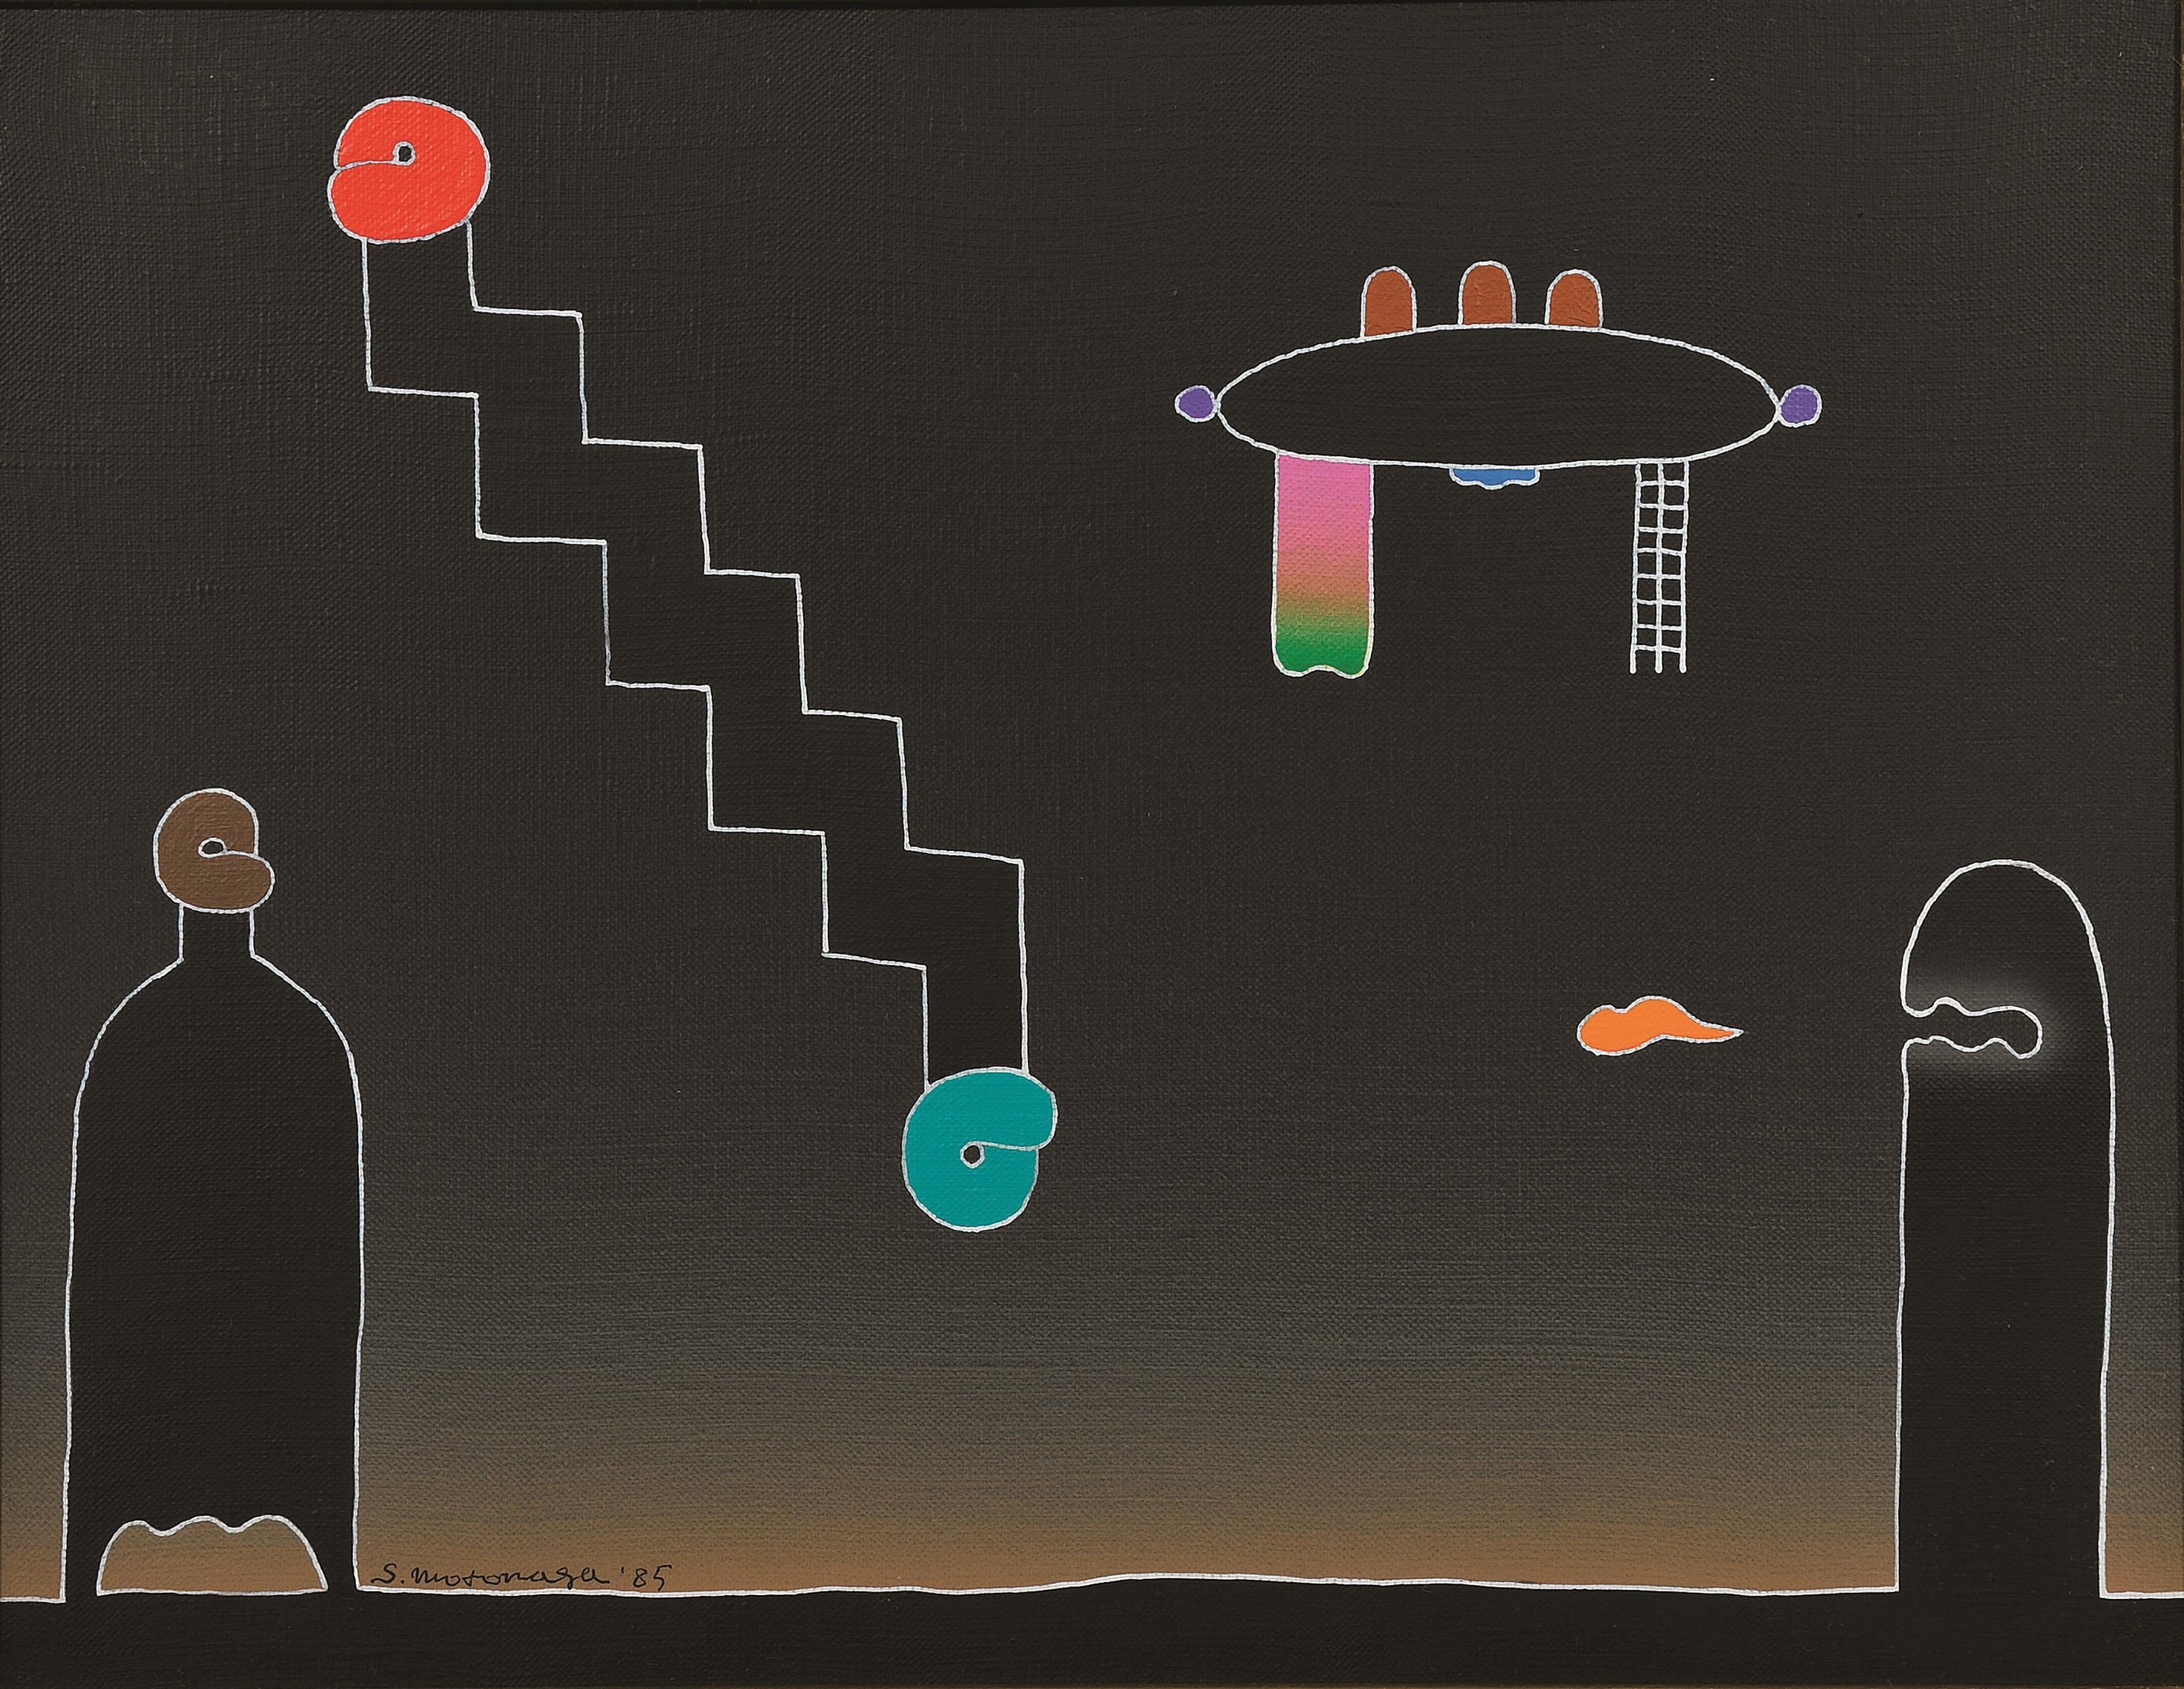 Like a stairway. Acrylic on canvas painting by Sadamasa Motonaga (1985)